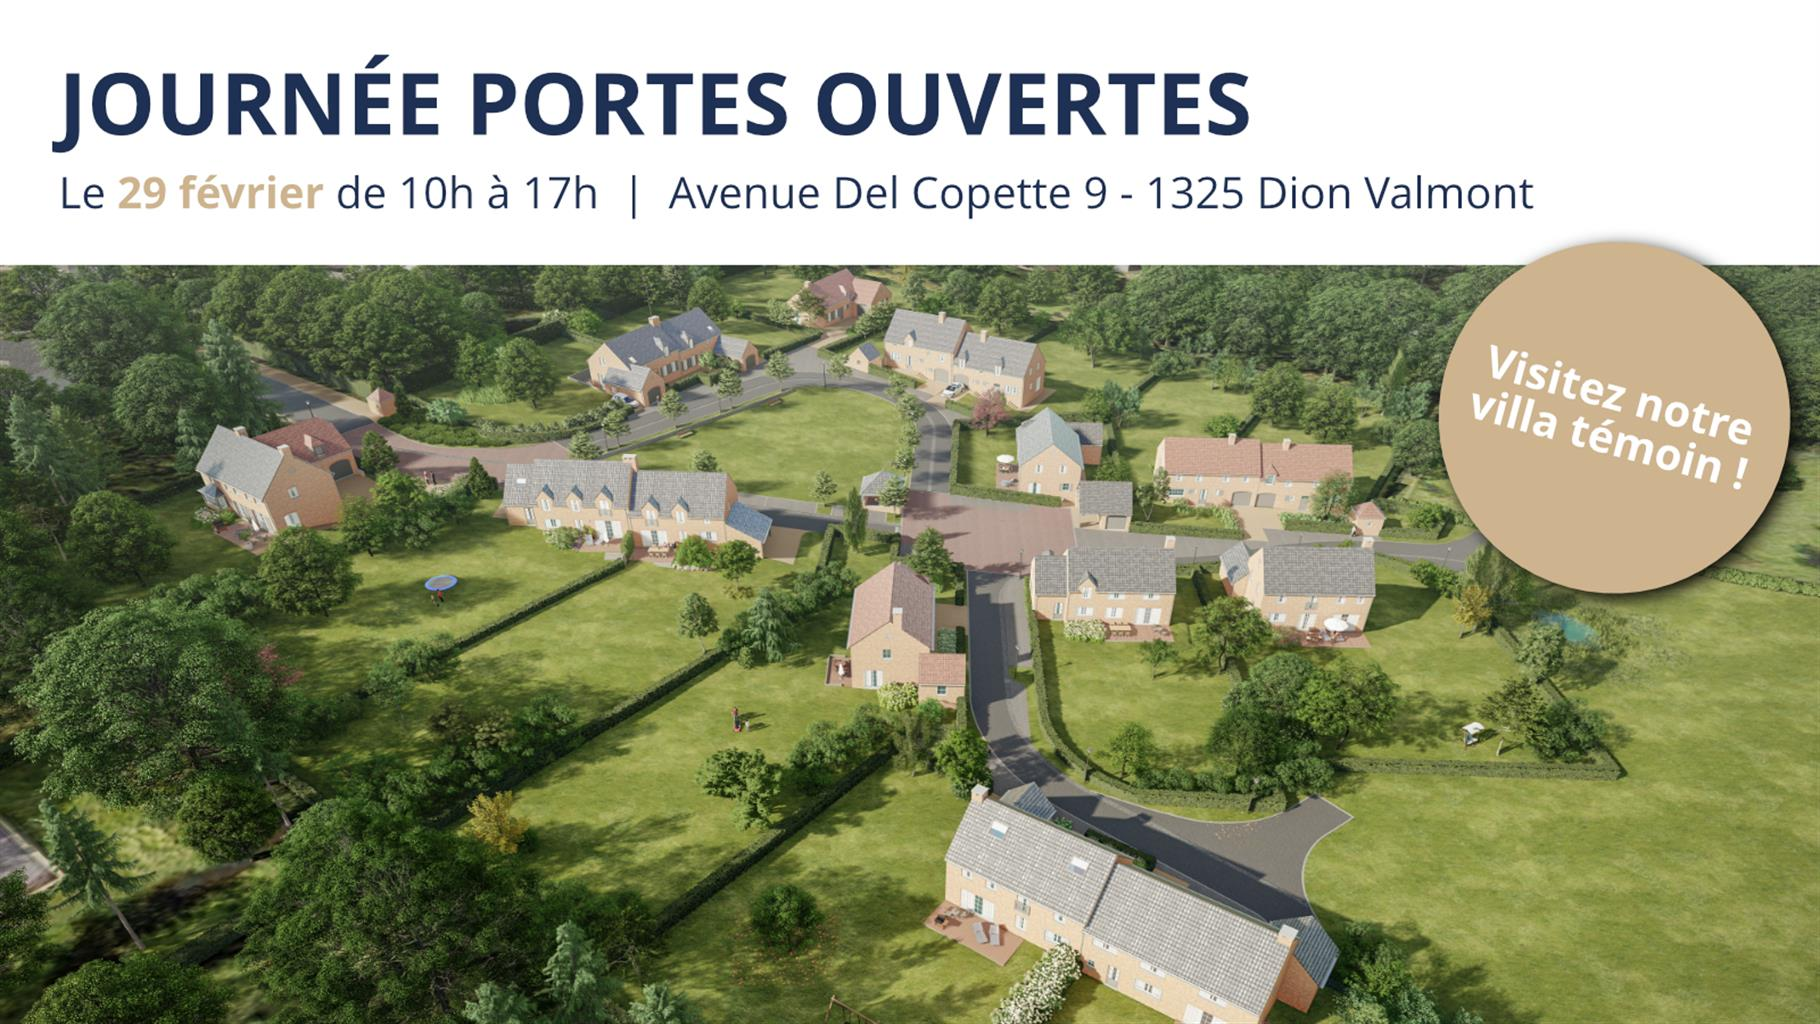 Maison - Dion-Valmont - #3963419-19